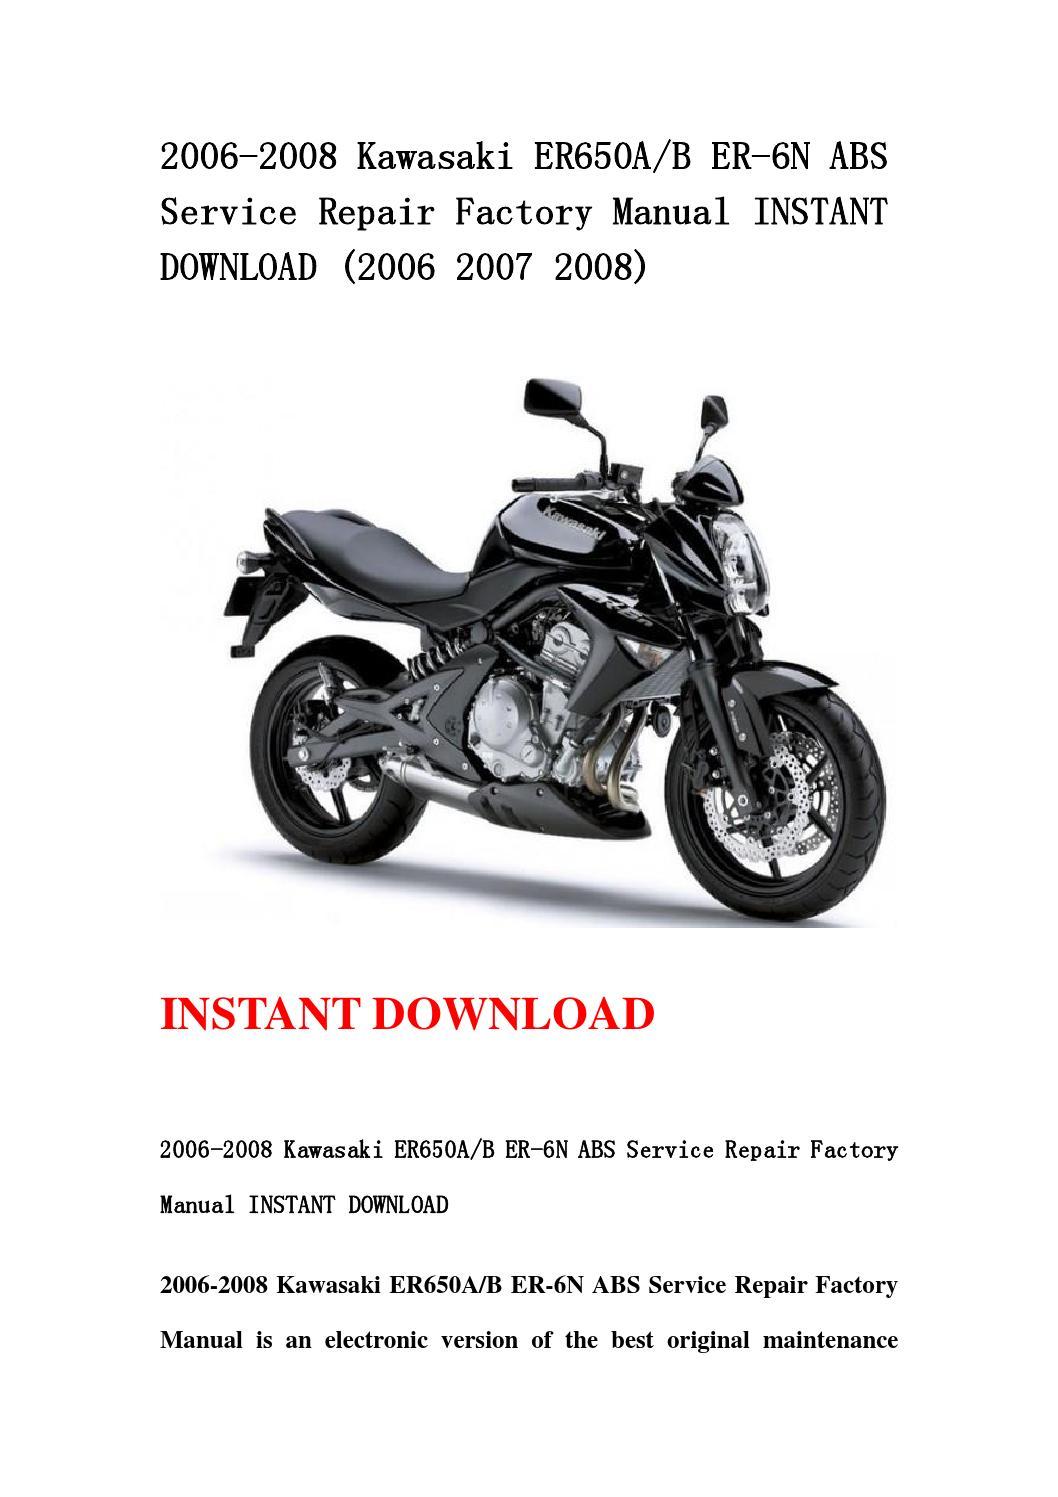 2006 2008 kawasaki er650ab er 6n abs service repair factory manual instant  download (2006 2007 2008) by manual-2 - issuu